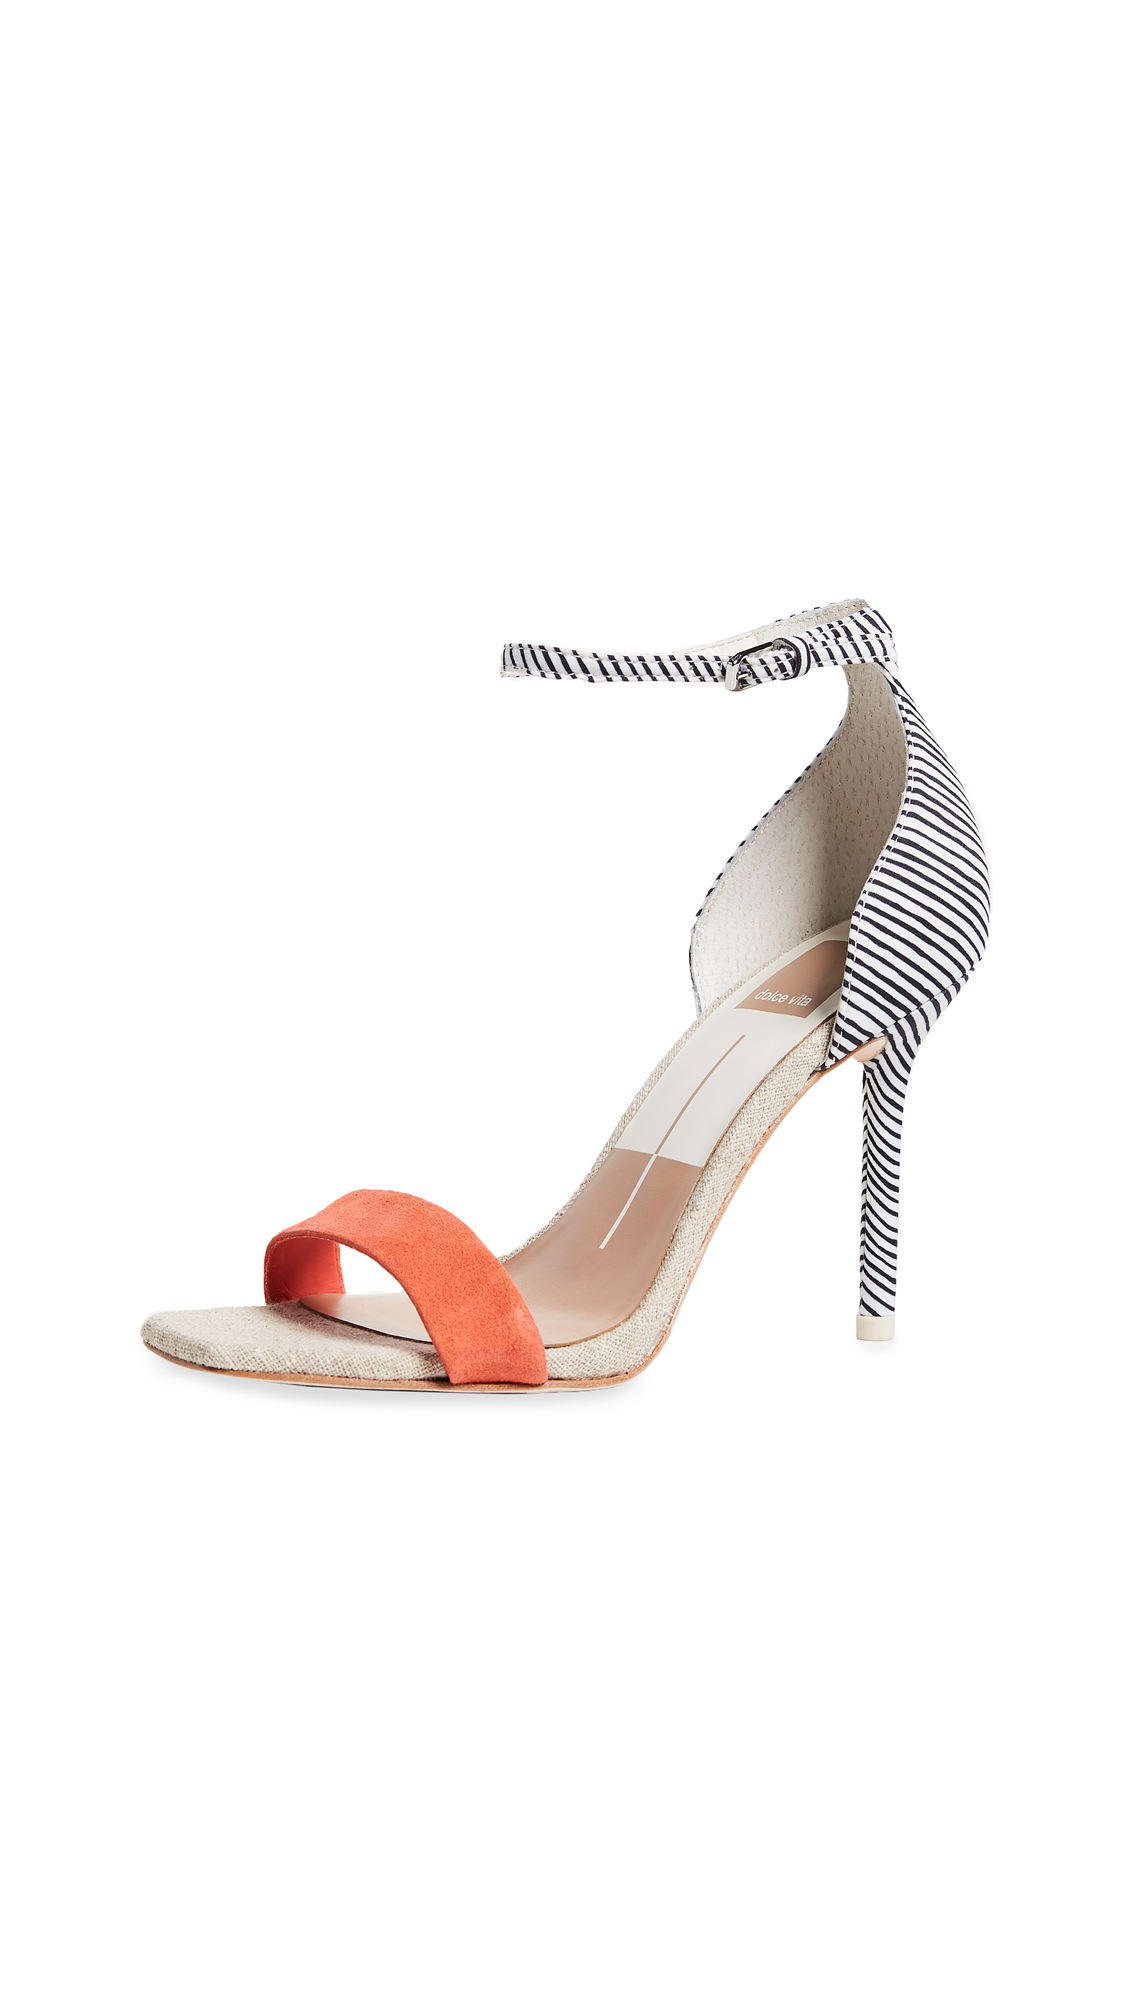 Dolce Vita Halo Ankle Strap Sandals - White Stripe